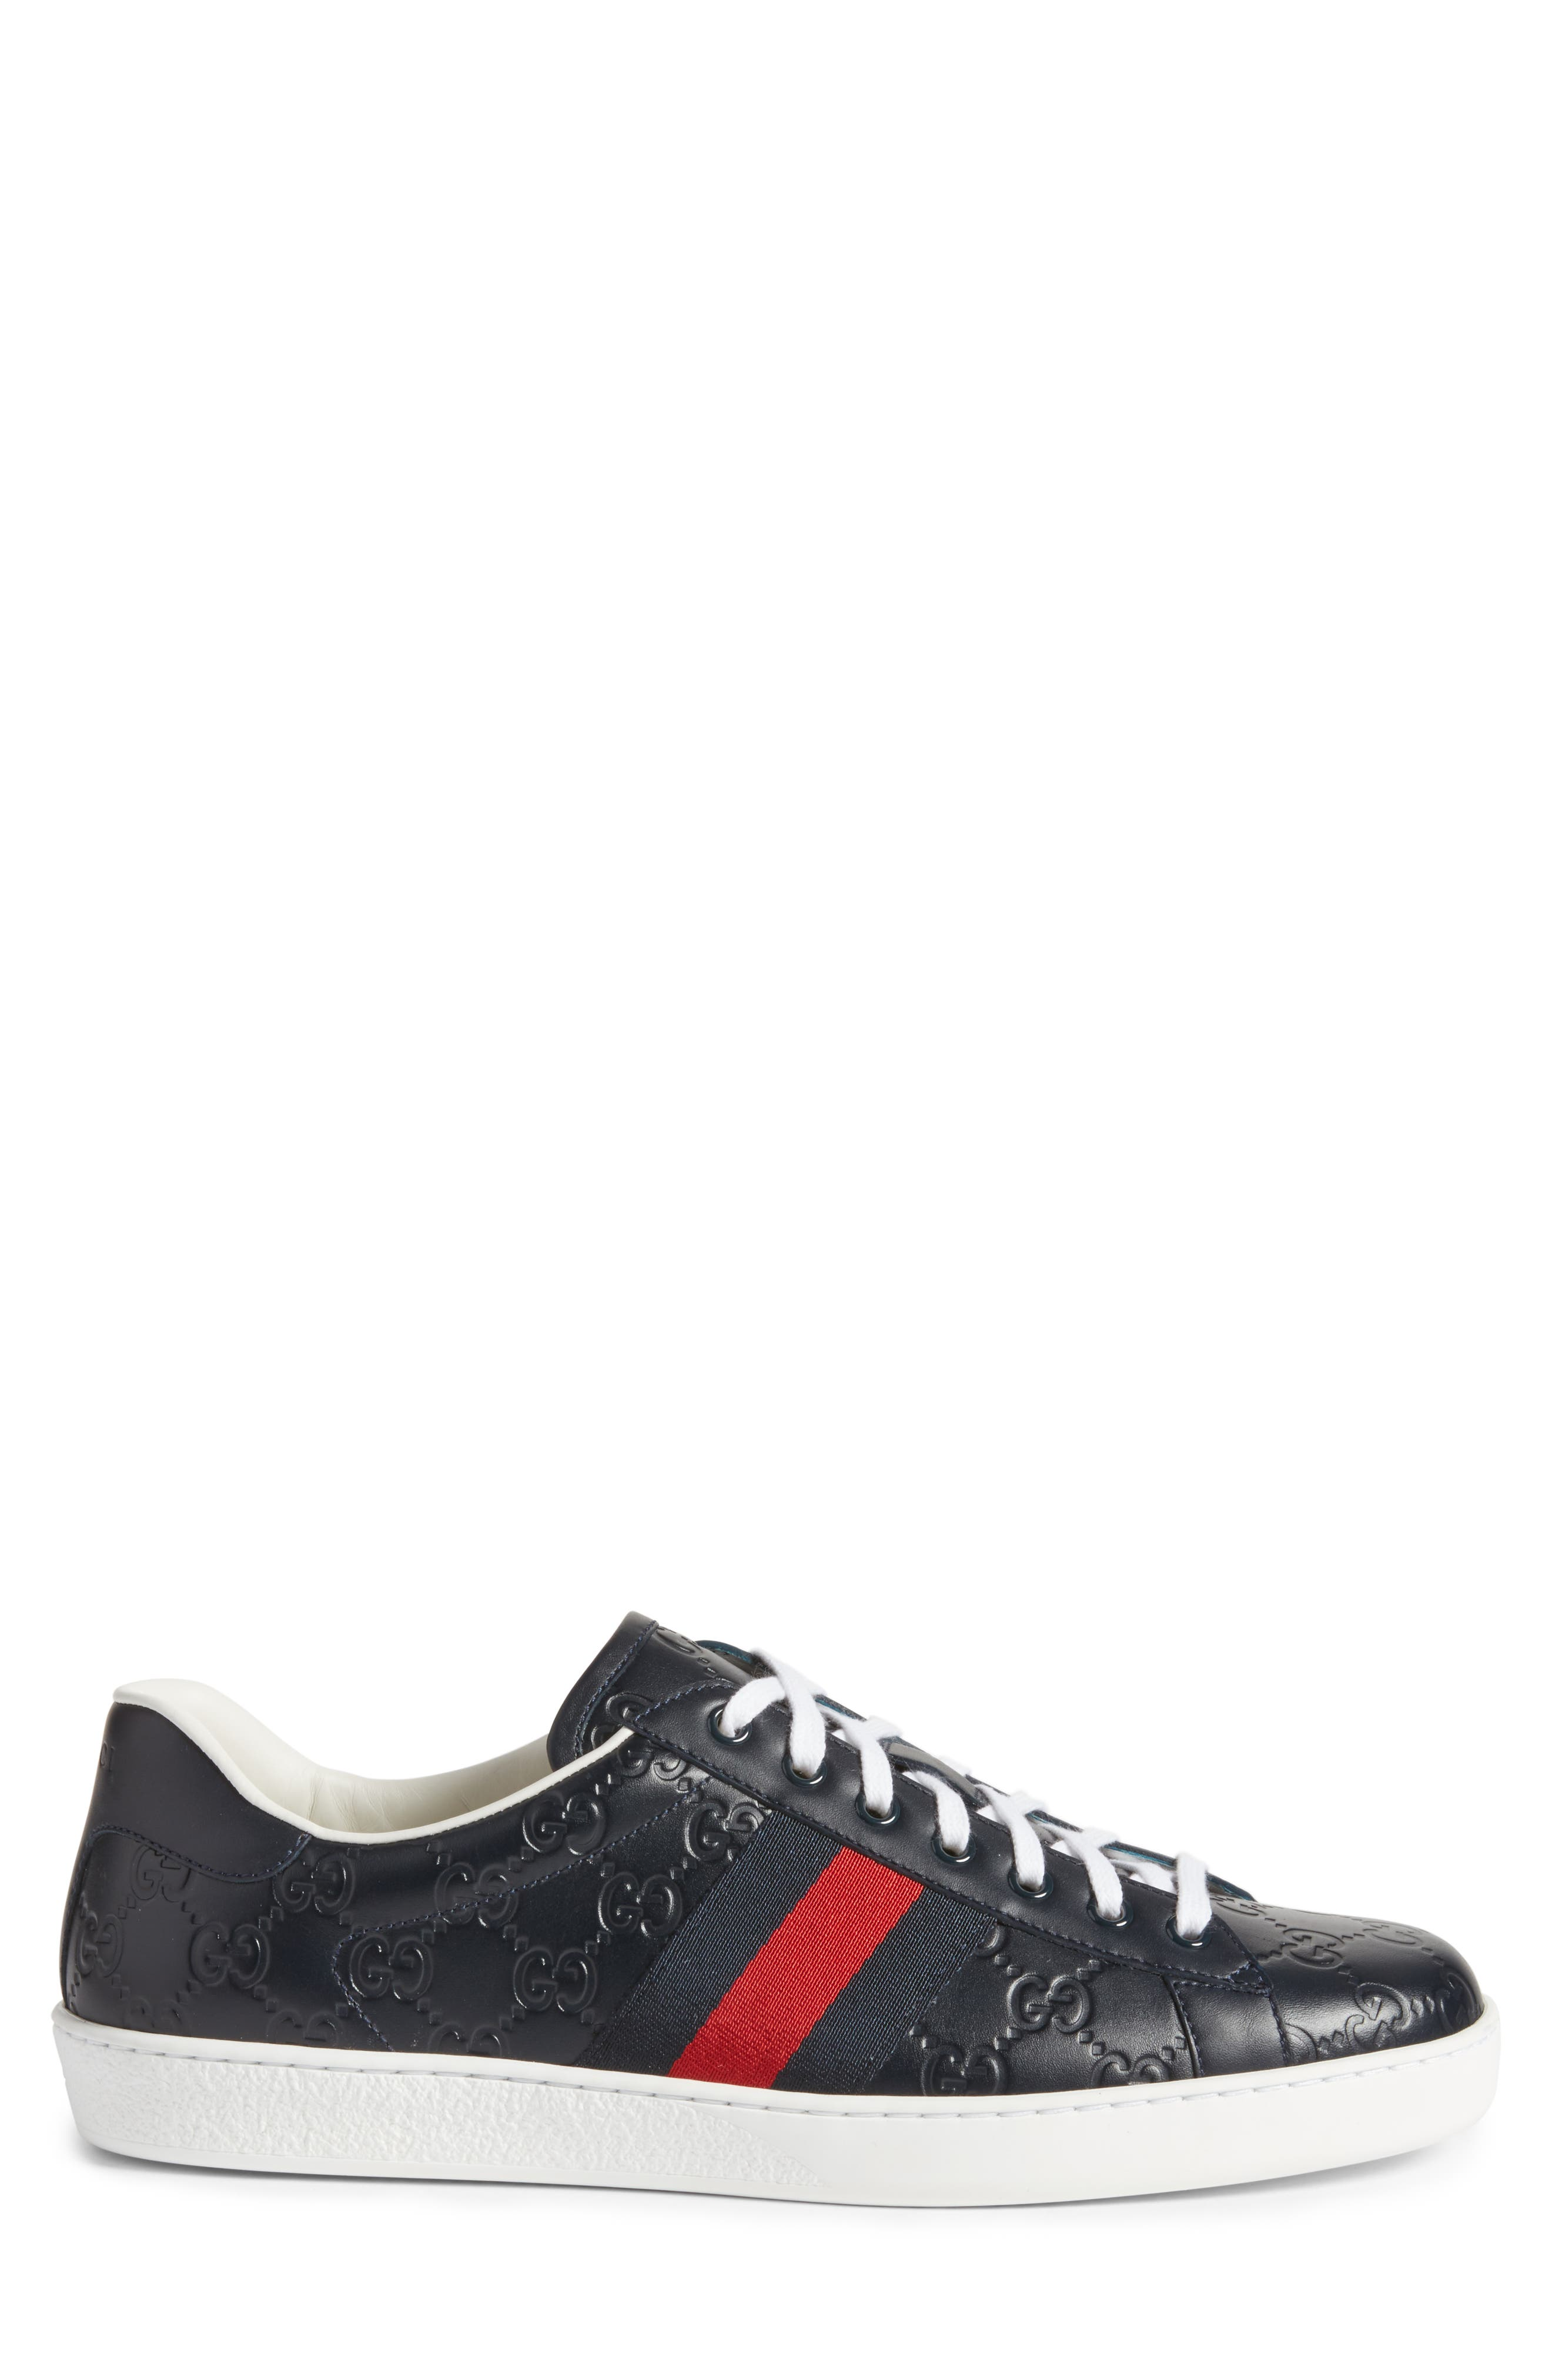 Alternate Image 3  - Gucci 'New Ace' Sneaker (Men)